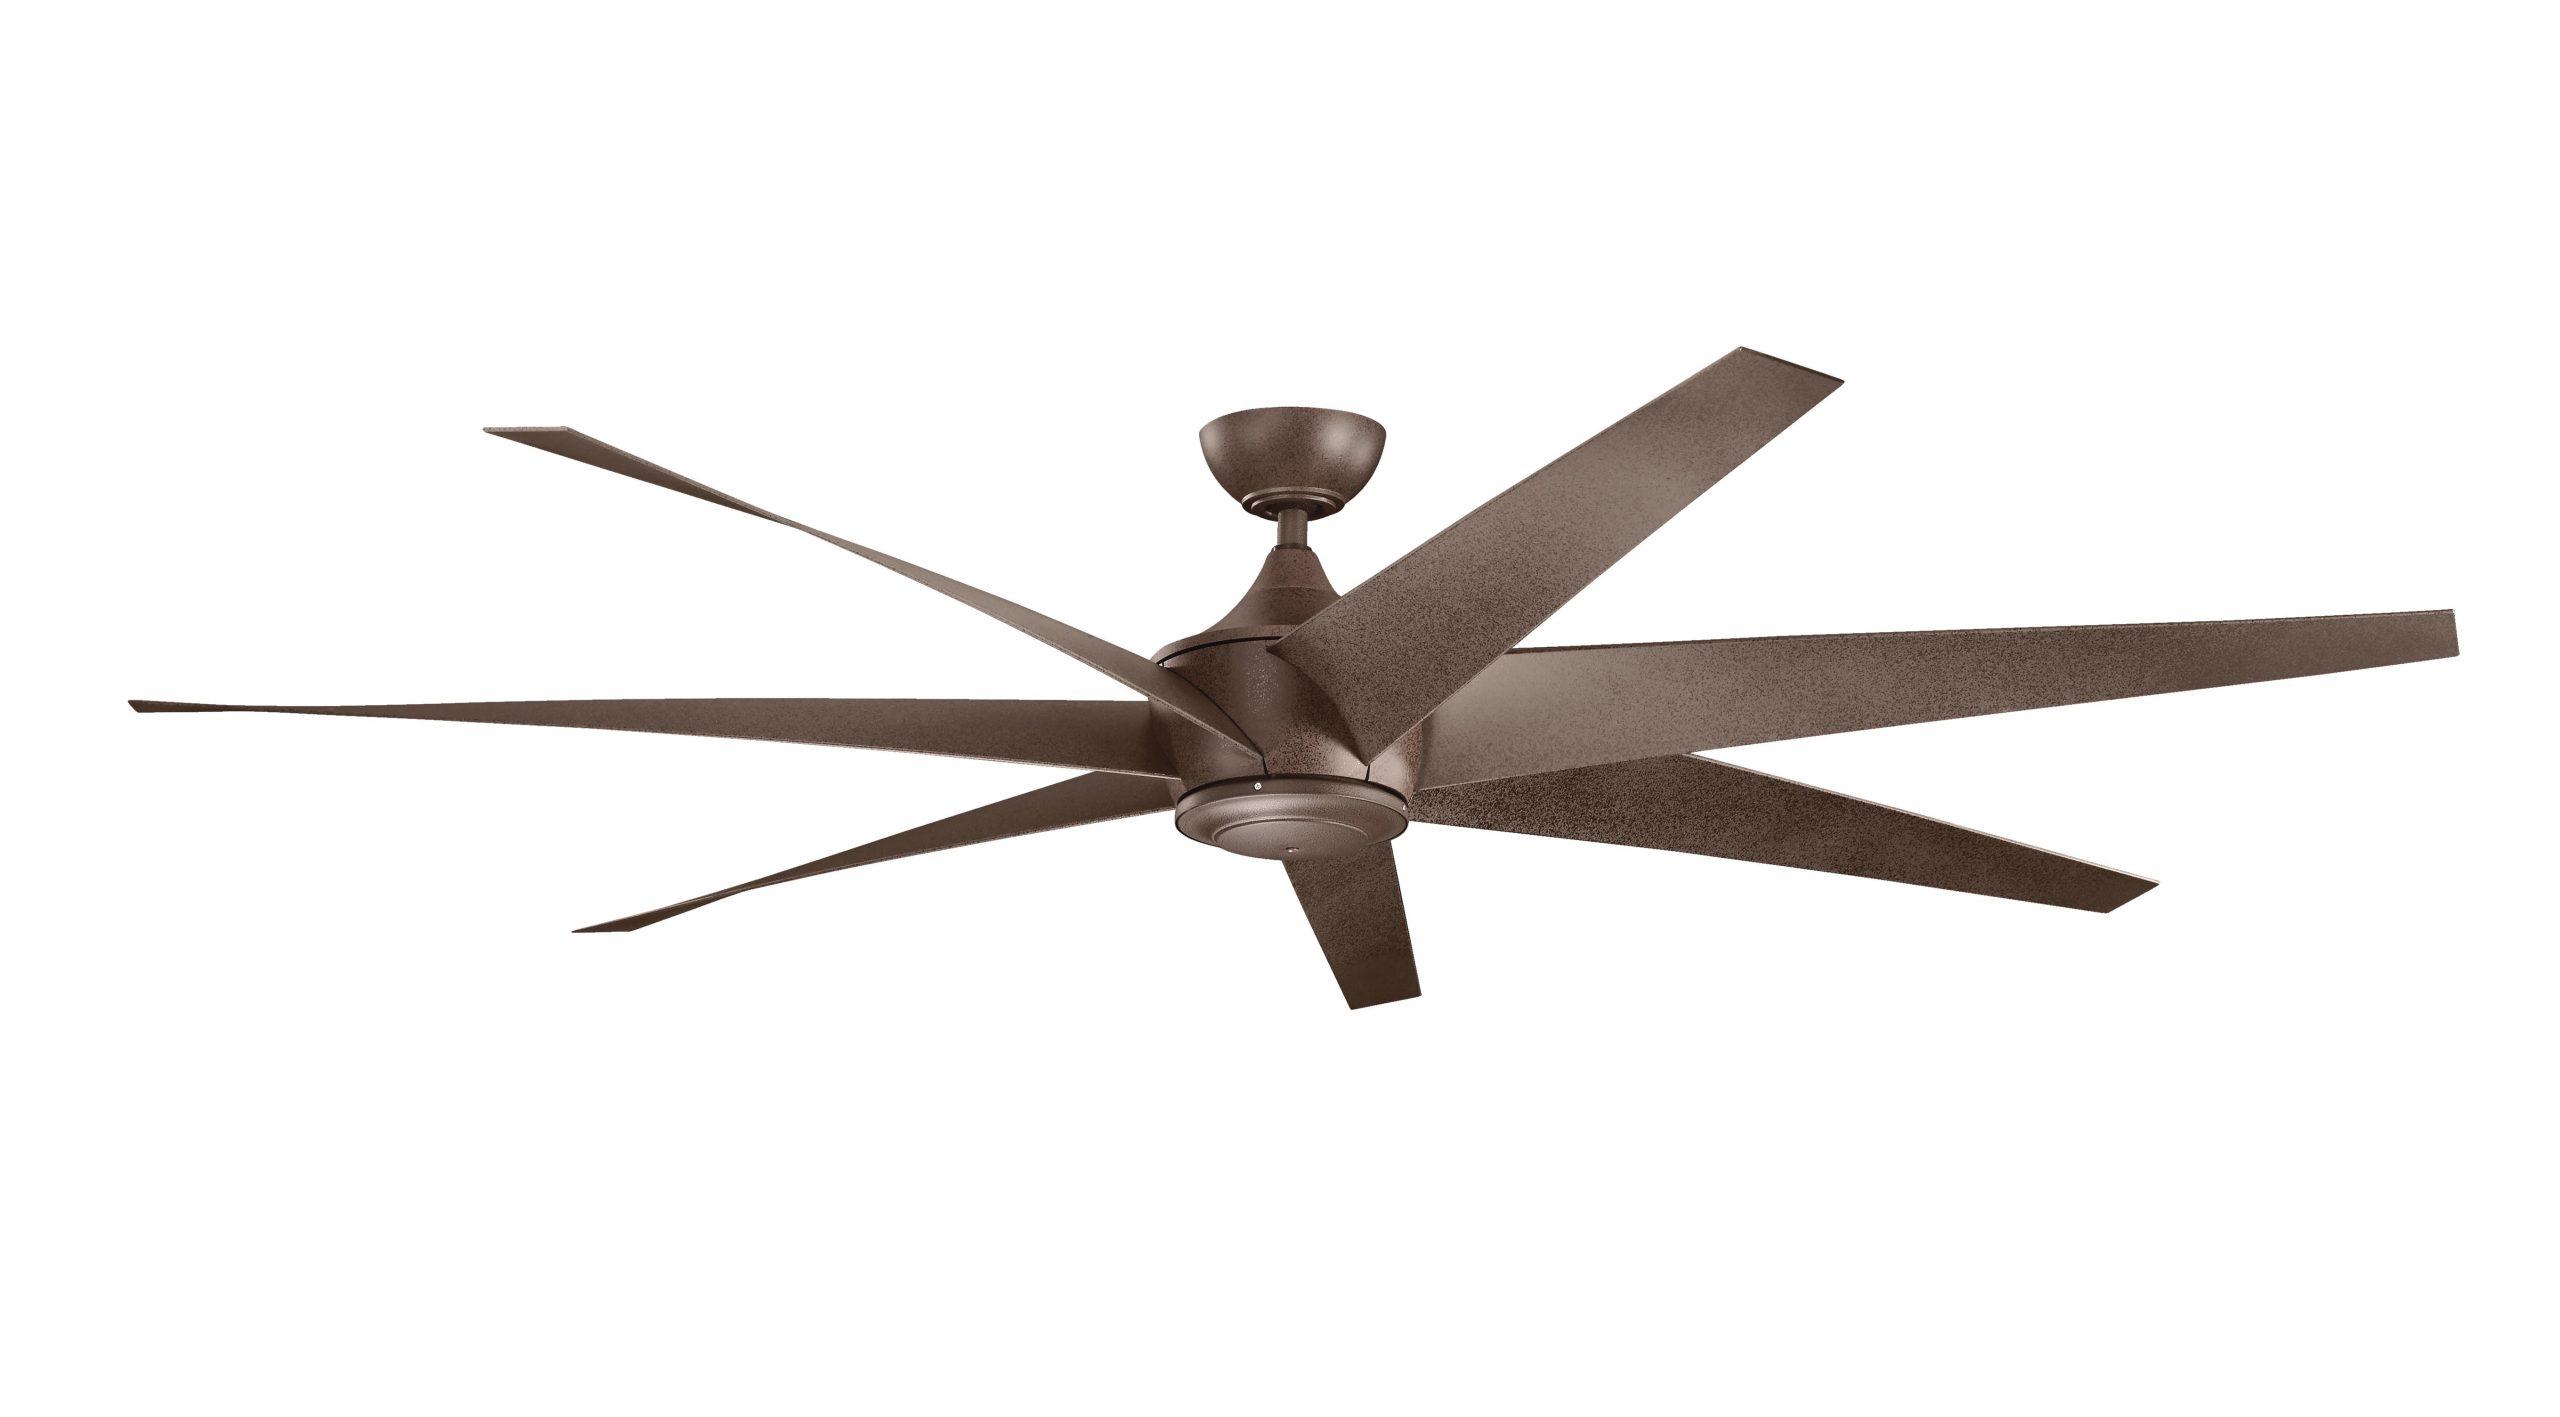 Kichler Lehr Wet Climate Dc Ceiling Fan